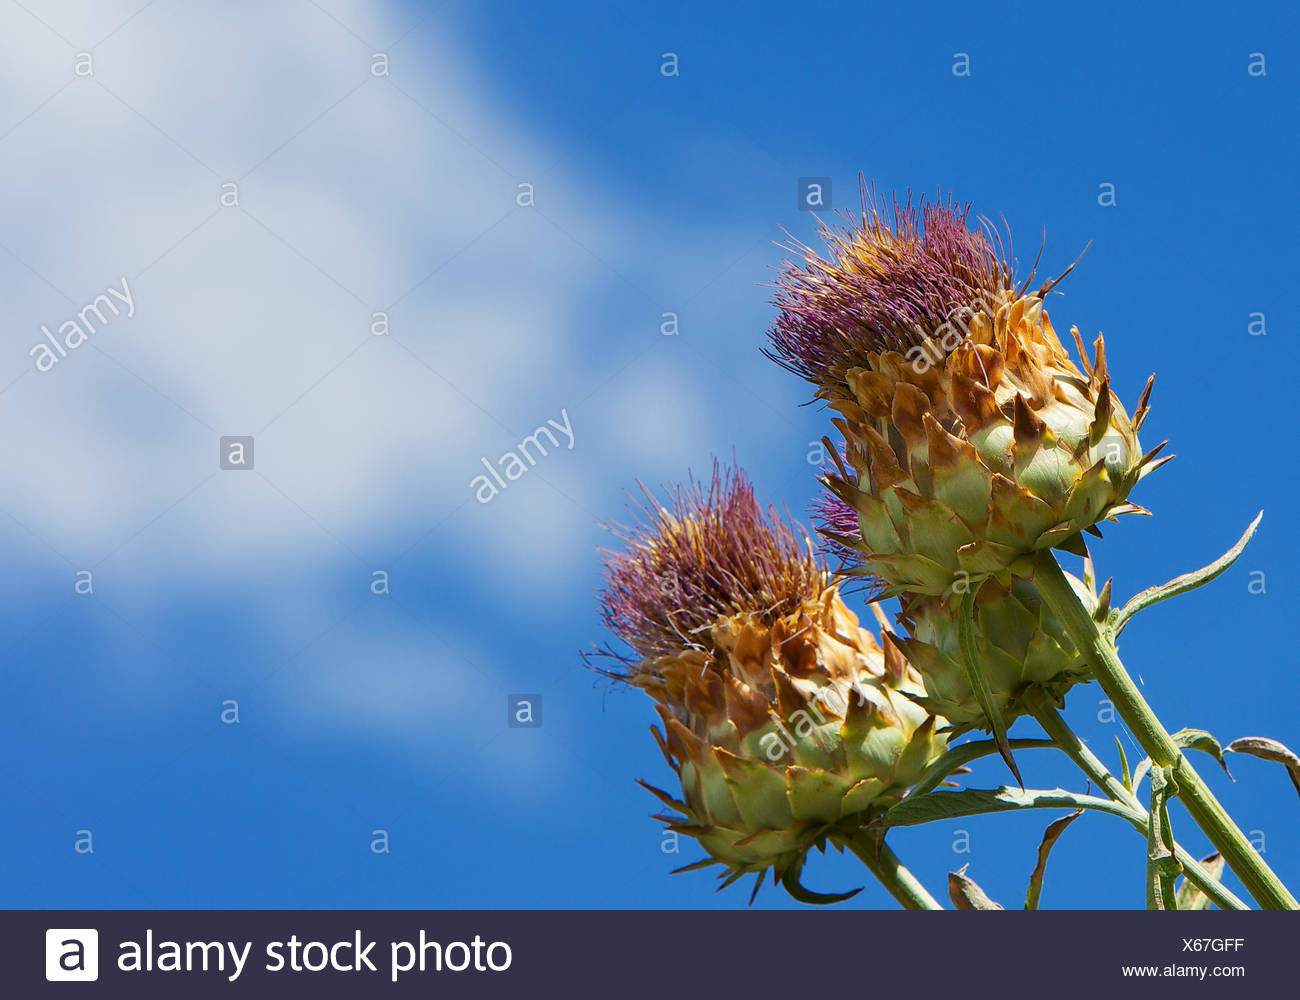 blue, wild, flora, botany, thistle, parachute, artichoke, edible, herb, seed, Stock Photo